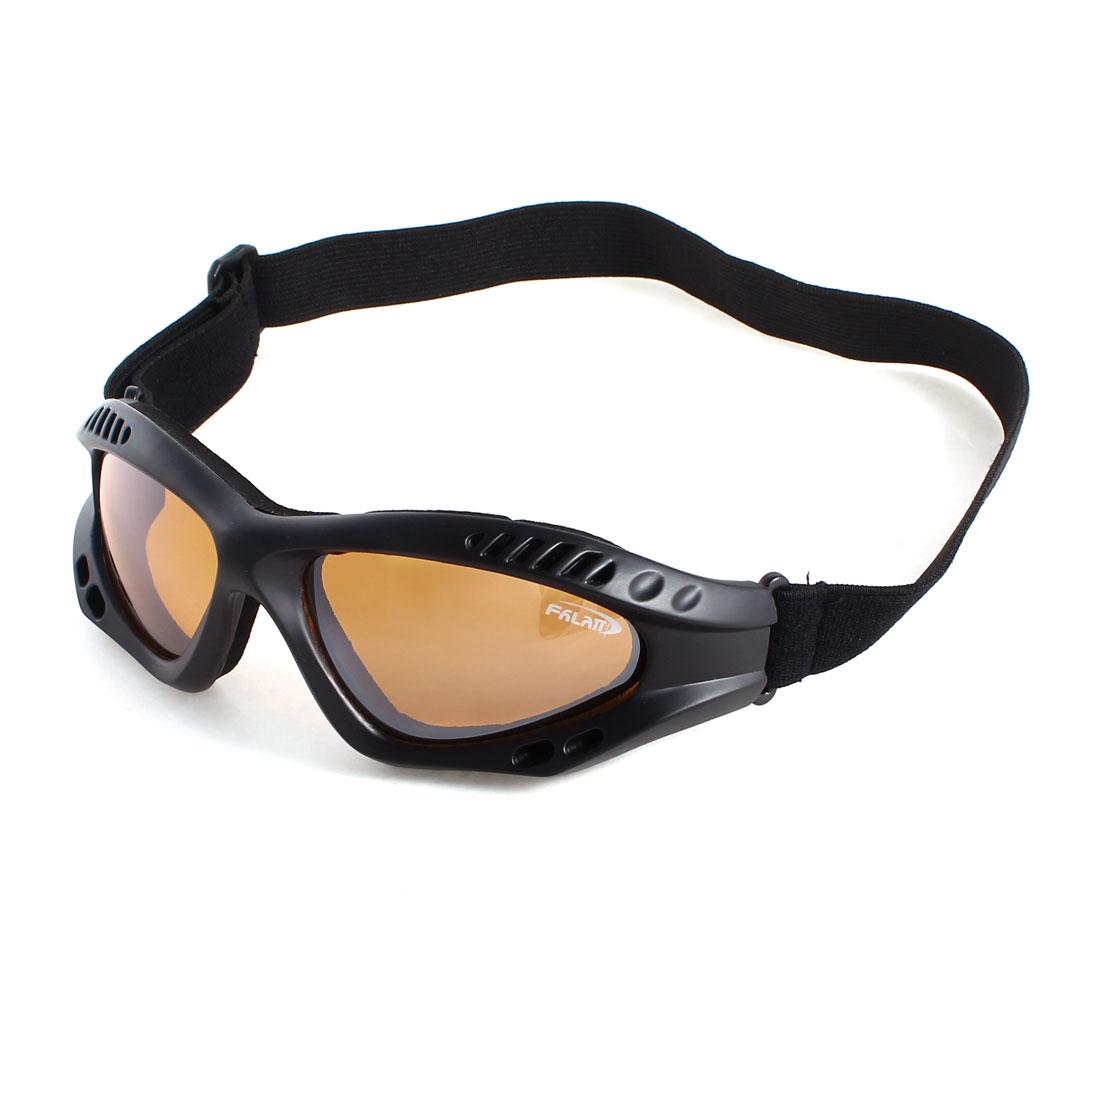 Motorcycle Riding Ski Glasses Orange Lens Sunglasses Anti Fog Biker Goggle